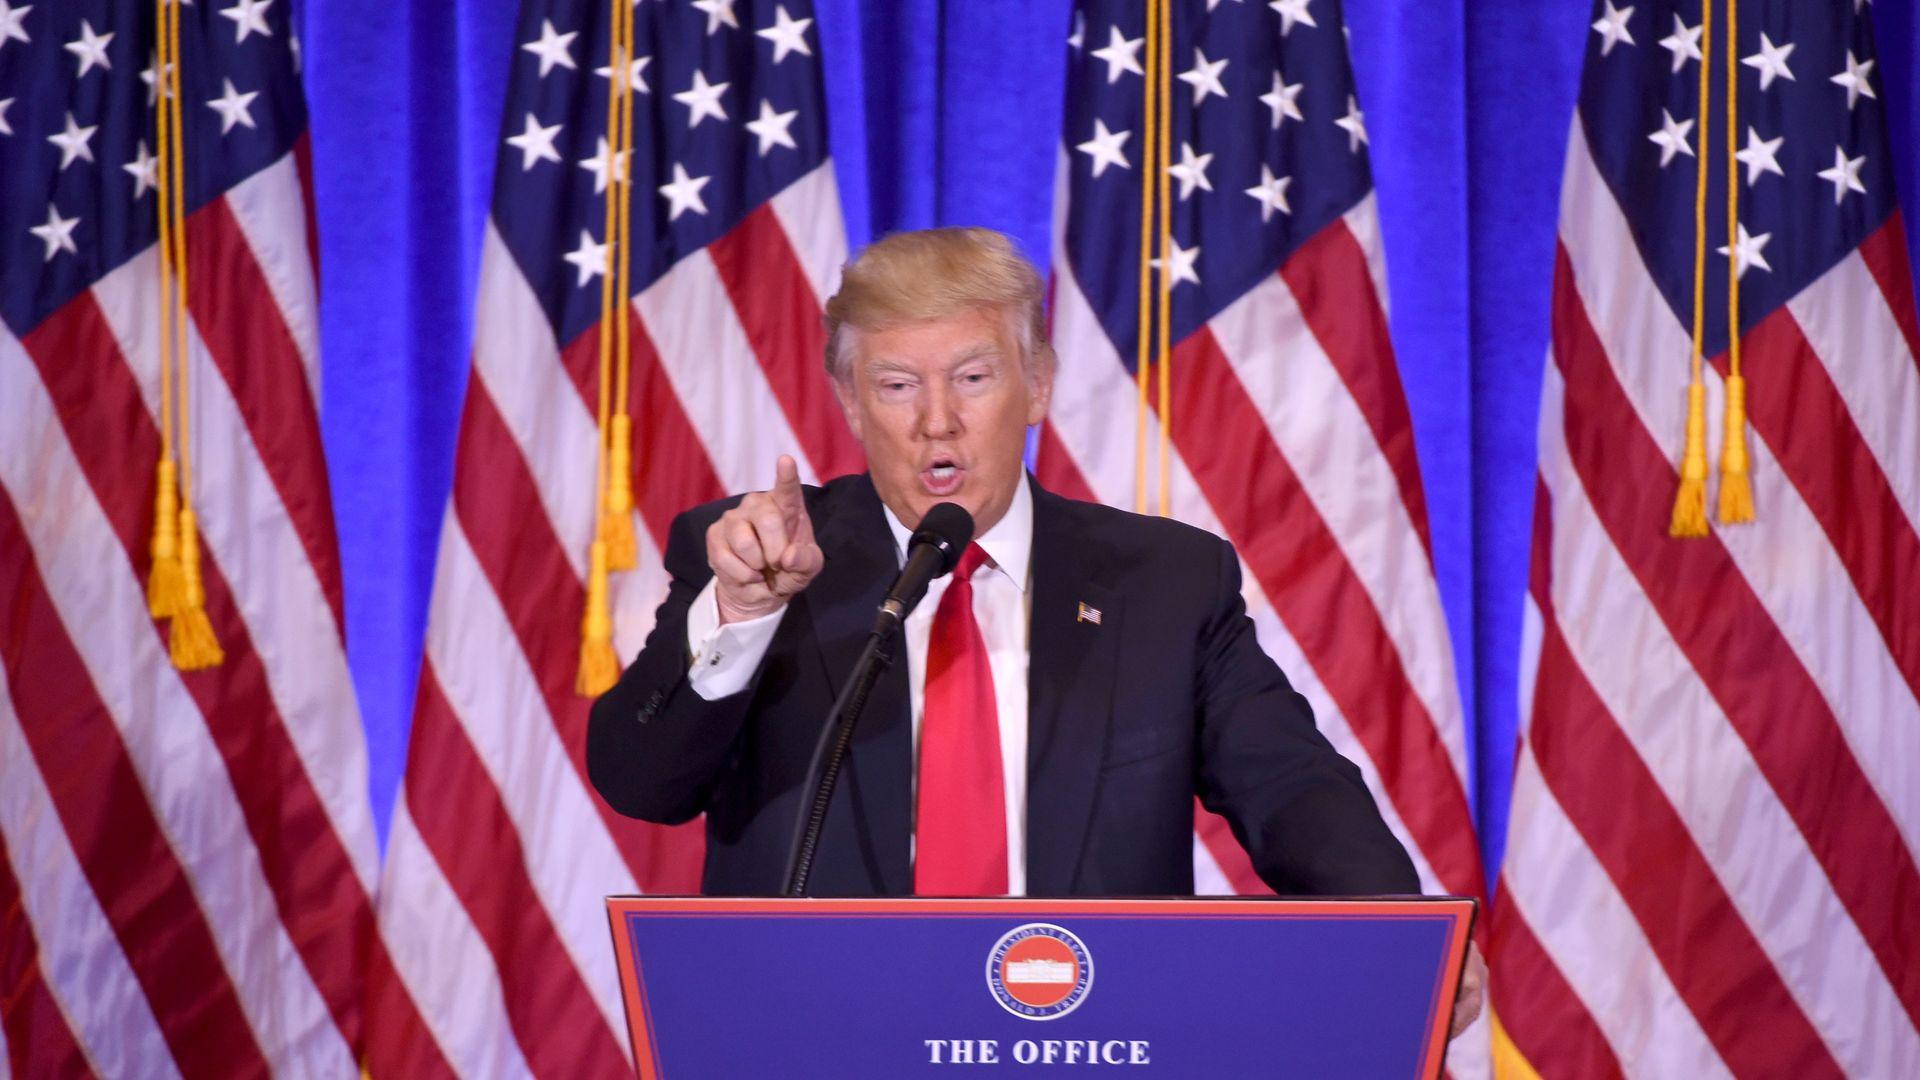 Trump addressing a CNN reporter